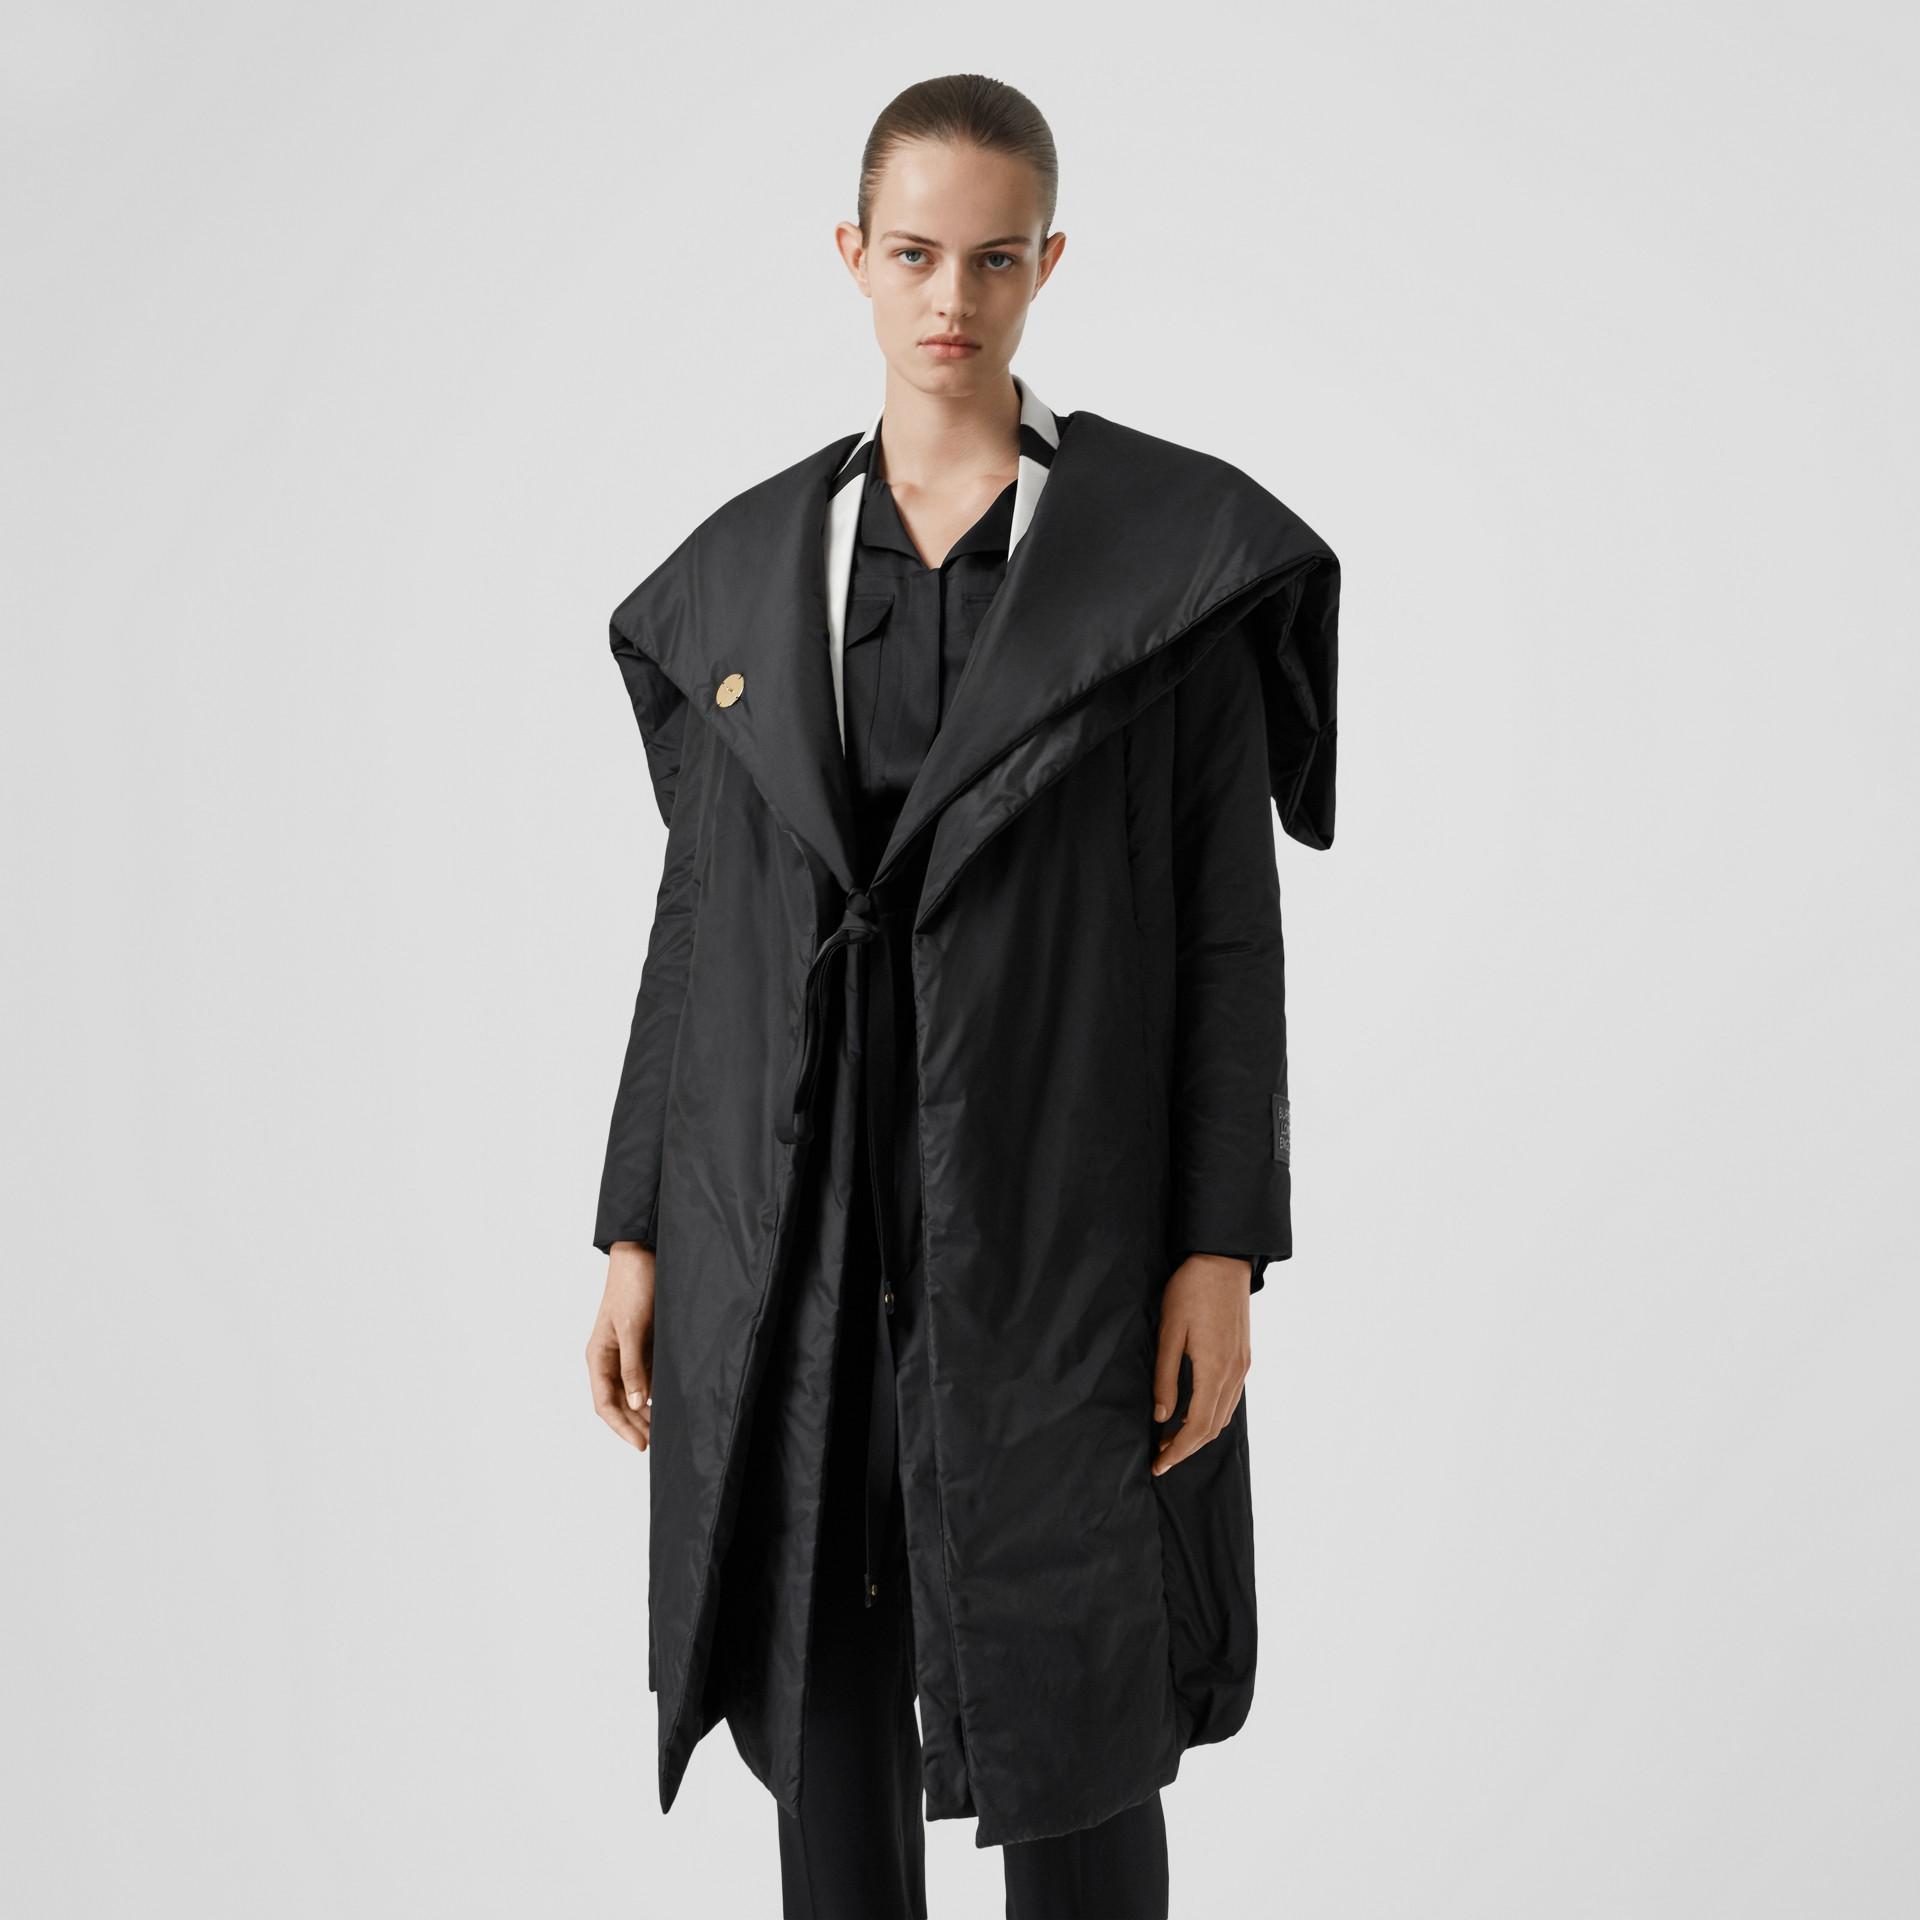 Cape Detail Silk Blend Wrap Coat in Black - Women | Burberry Singapore - gallery image 7